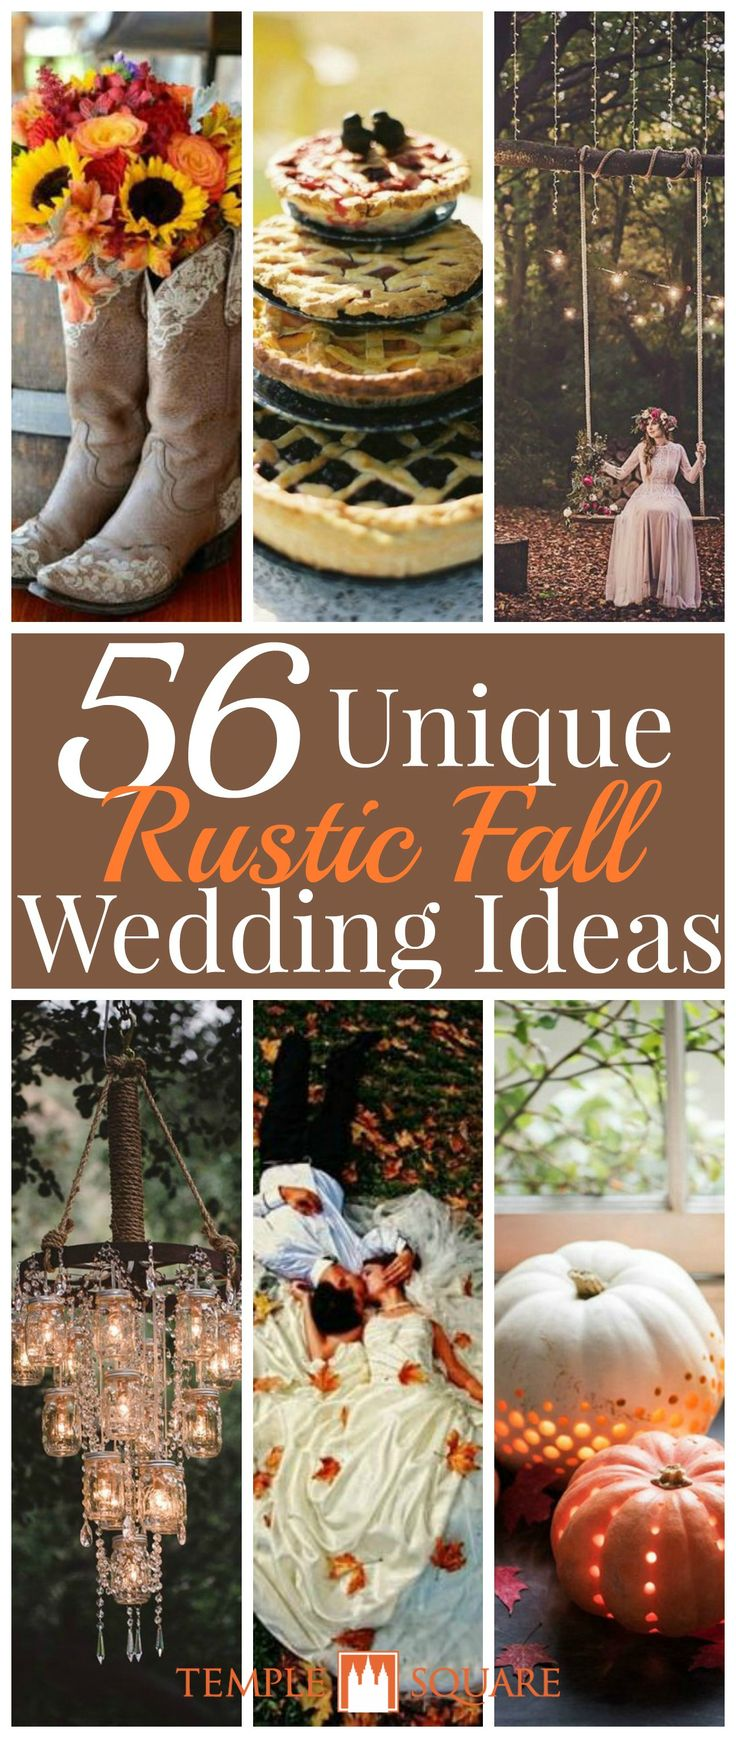 Best 25+ Unique pumpkin carving ideas ideas on Pinterest | Pumpkin ...